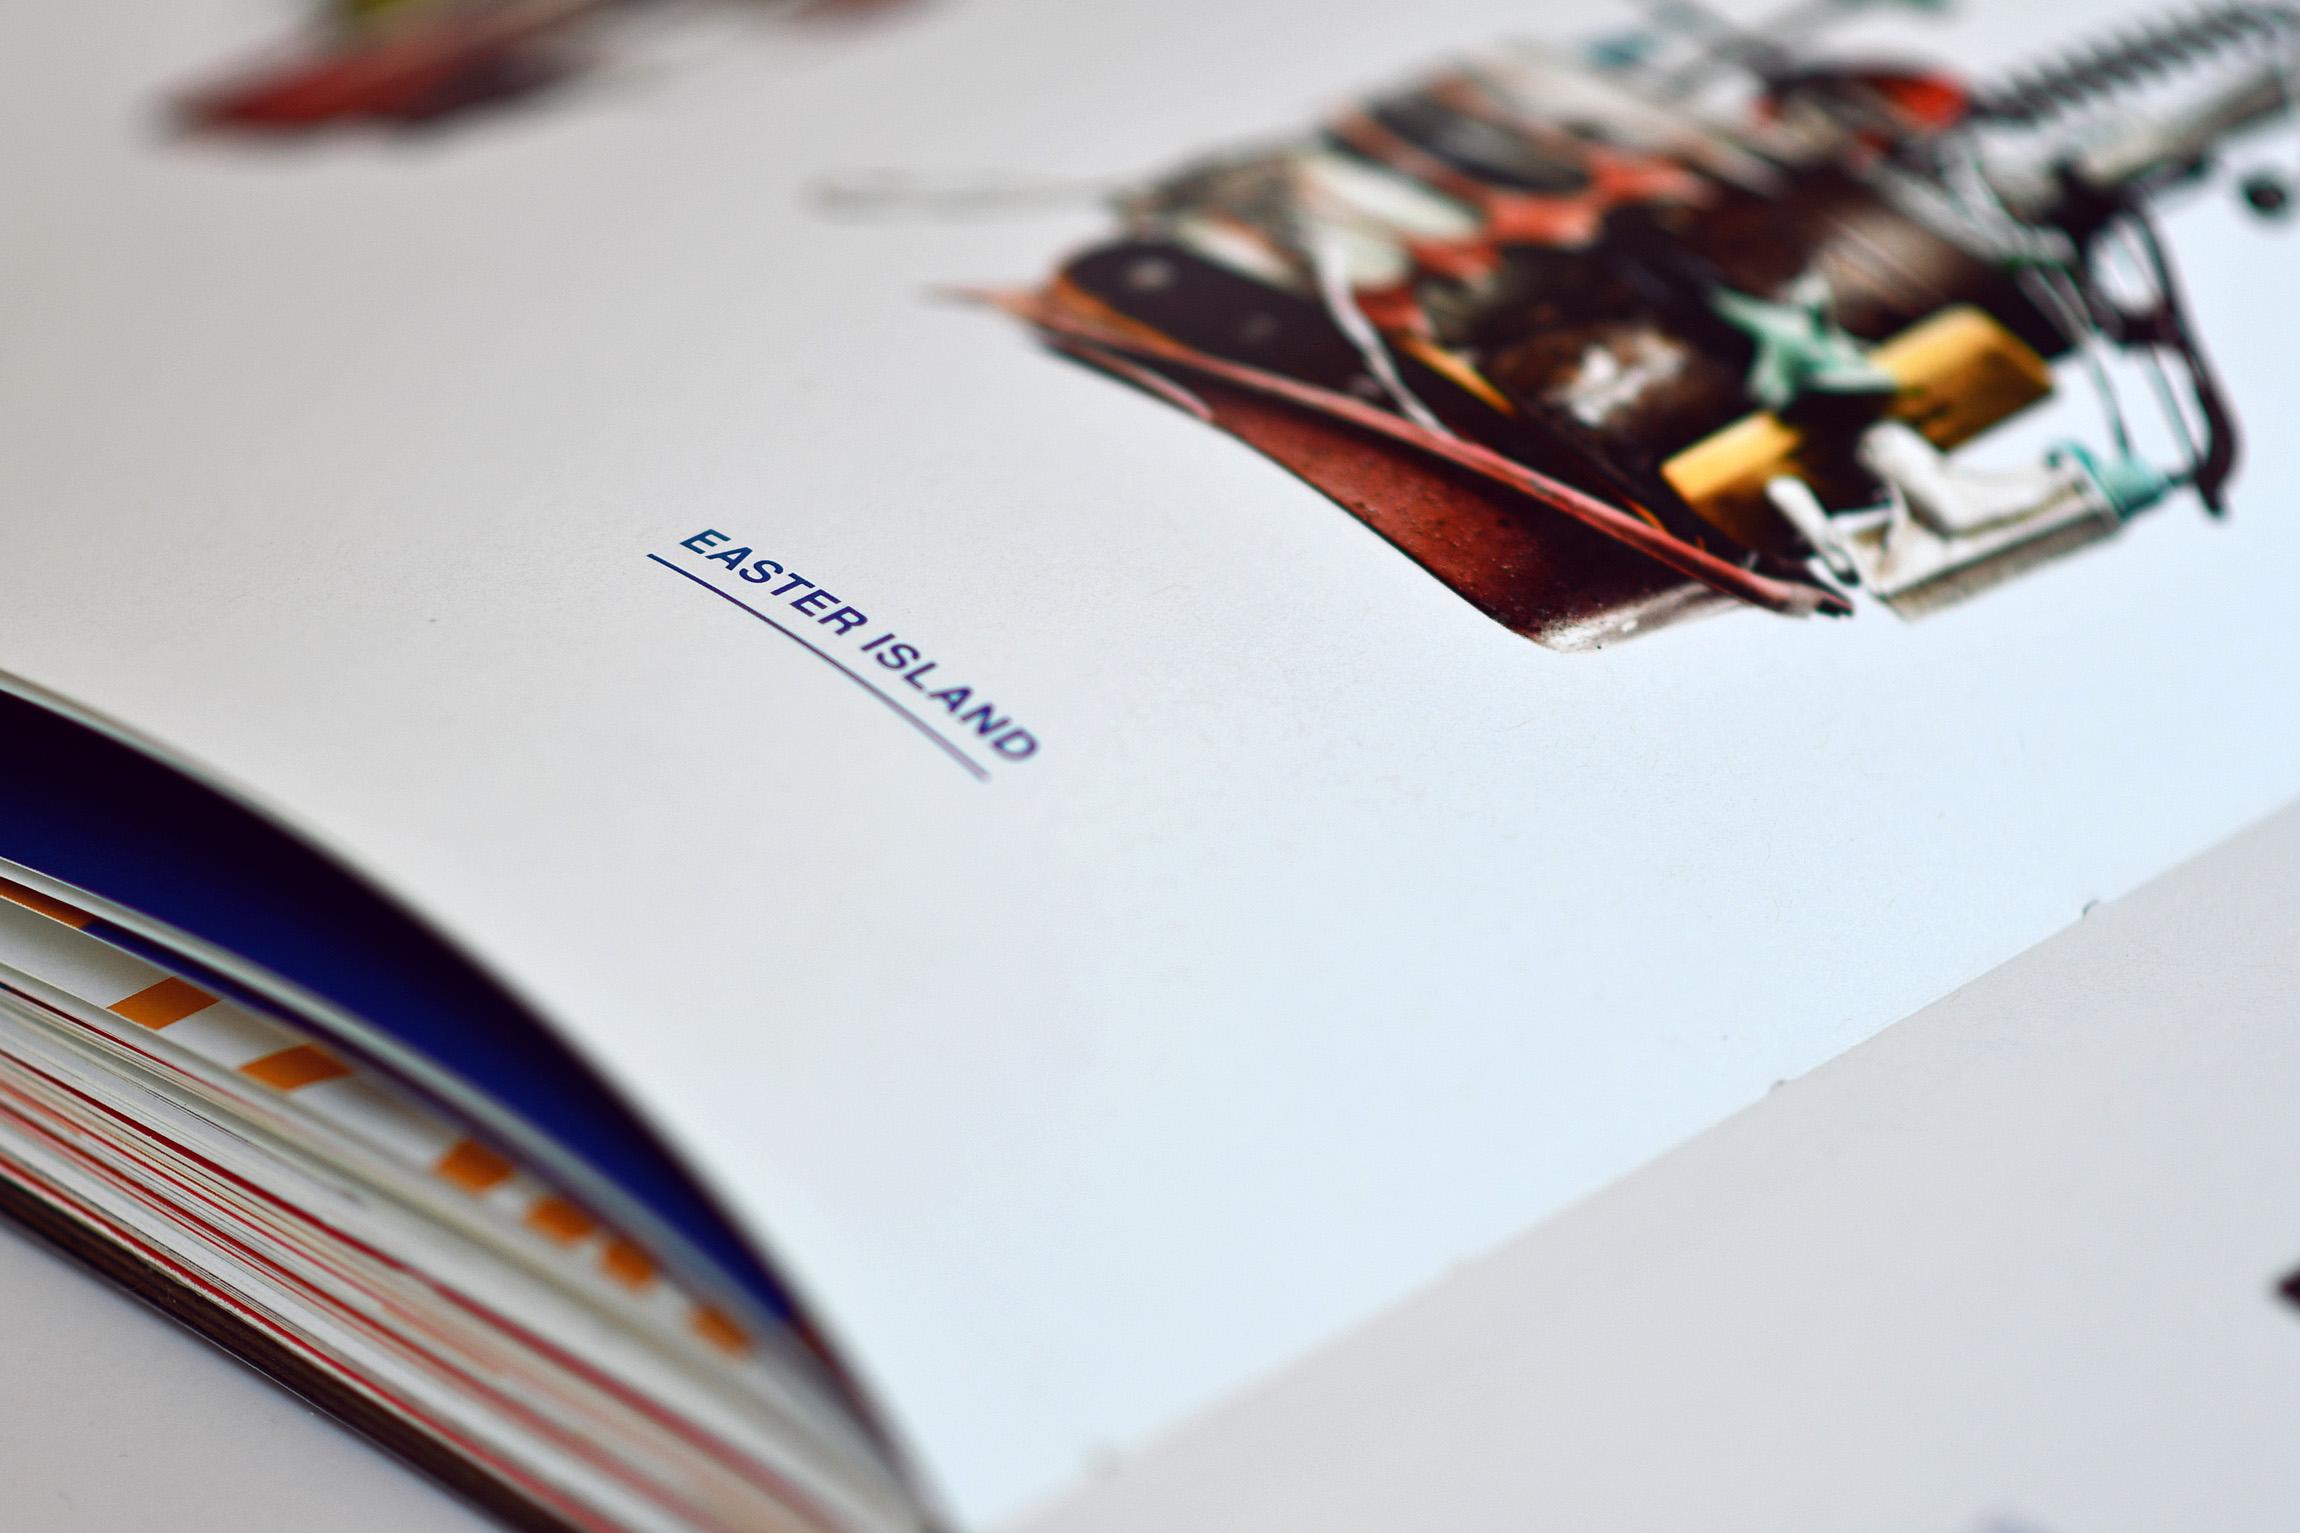 BOOK_COVER_CLOSE_UP_02.jpg